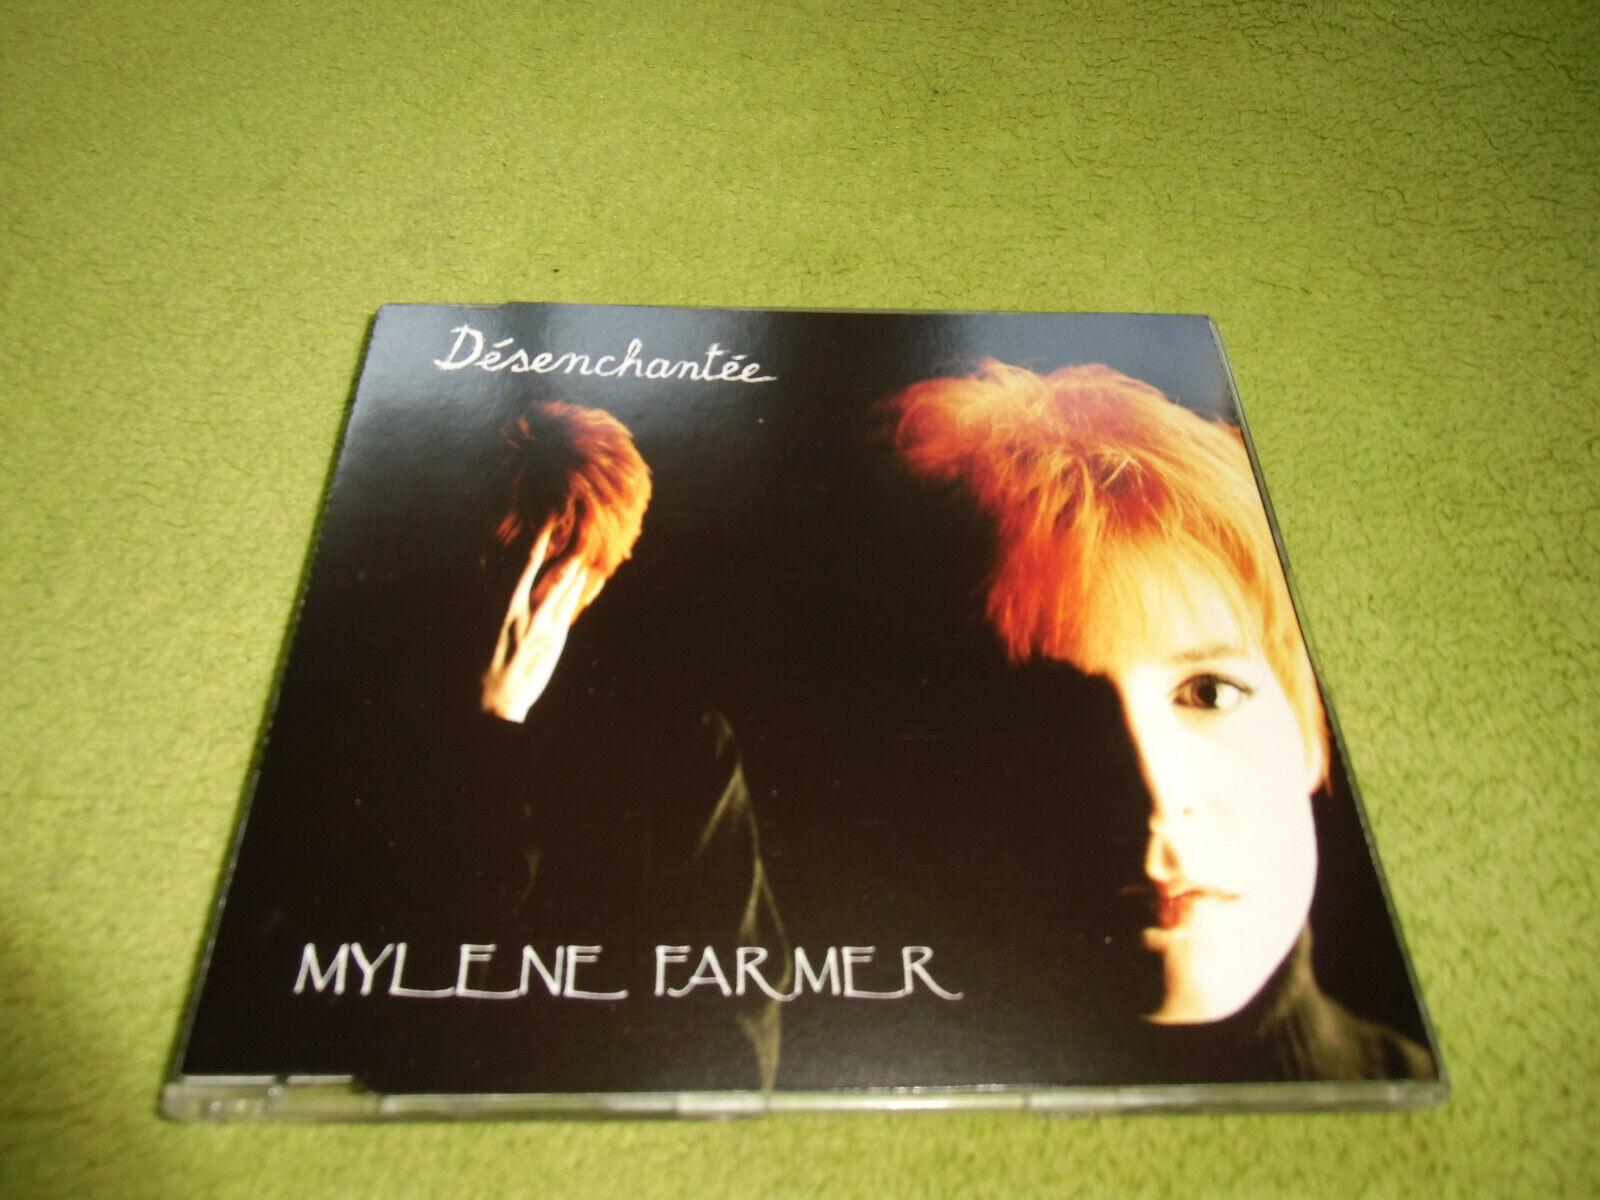 Mylene Farmer DESENCHANTEE maxi cd 20 online kaufen   eBay